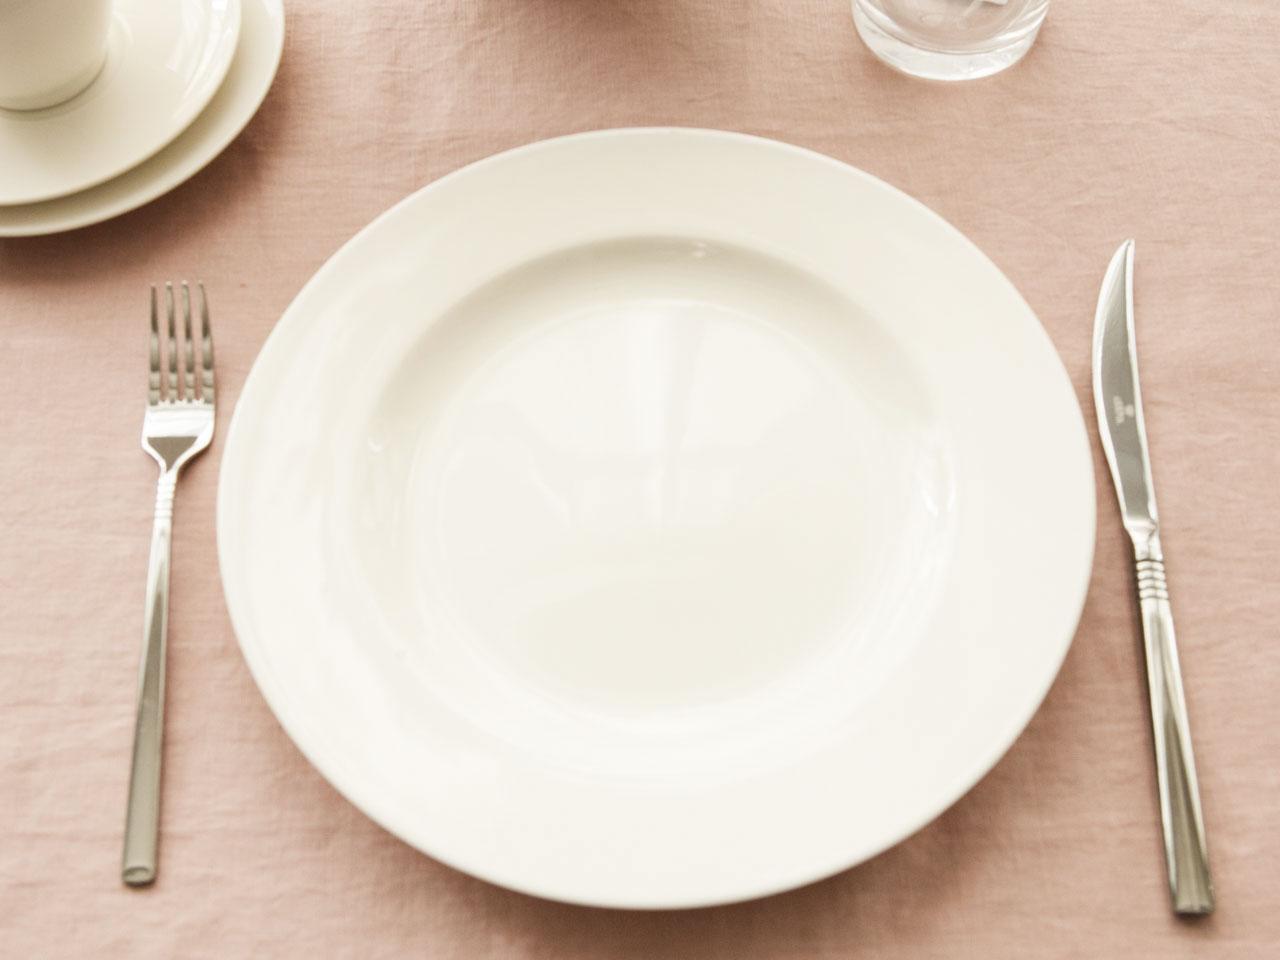 Talerz obiadowy porcelanowy MariaPaula Ecru Nova 26 cm